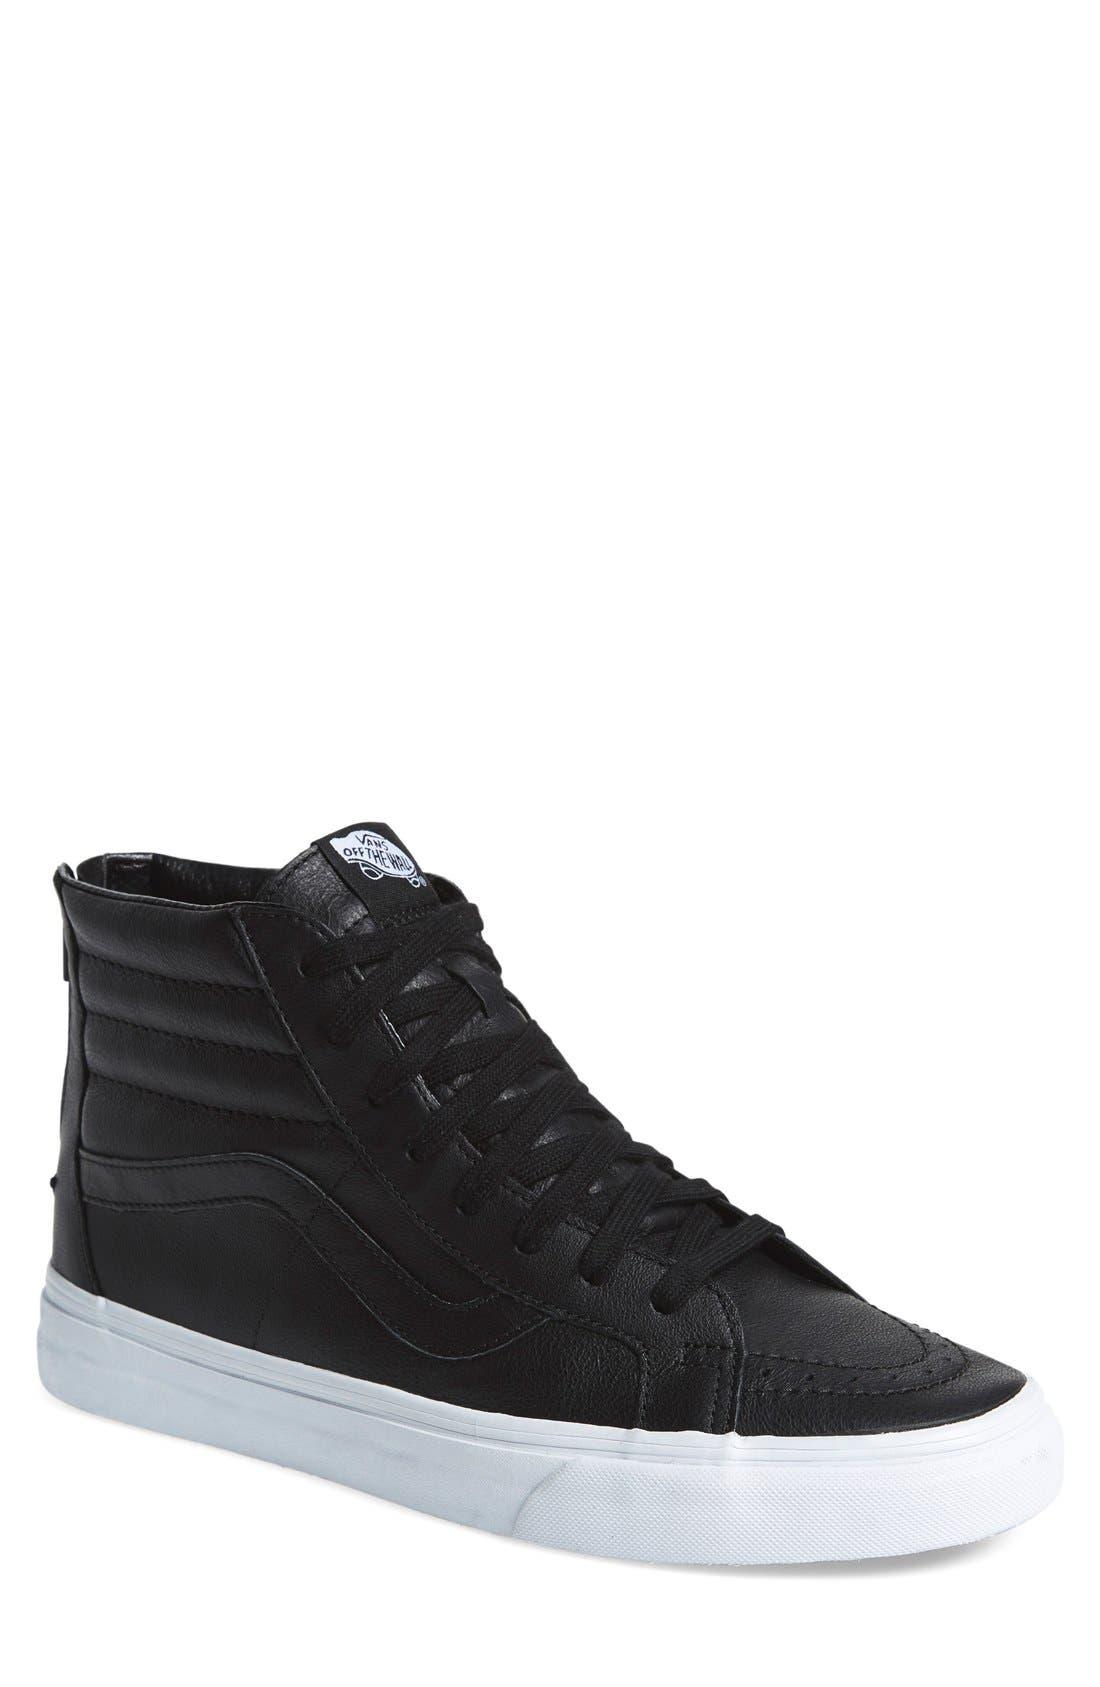 'Sk8-Hi Reissue' Sneaker,                         Main,                         color, 001